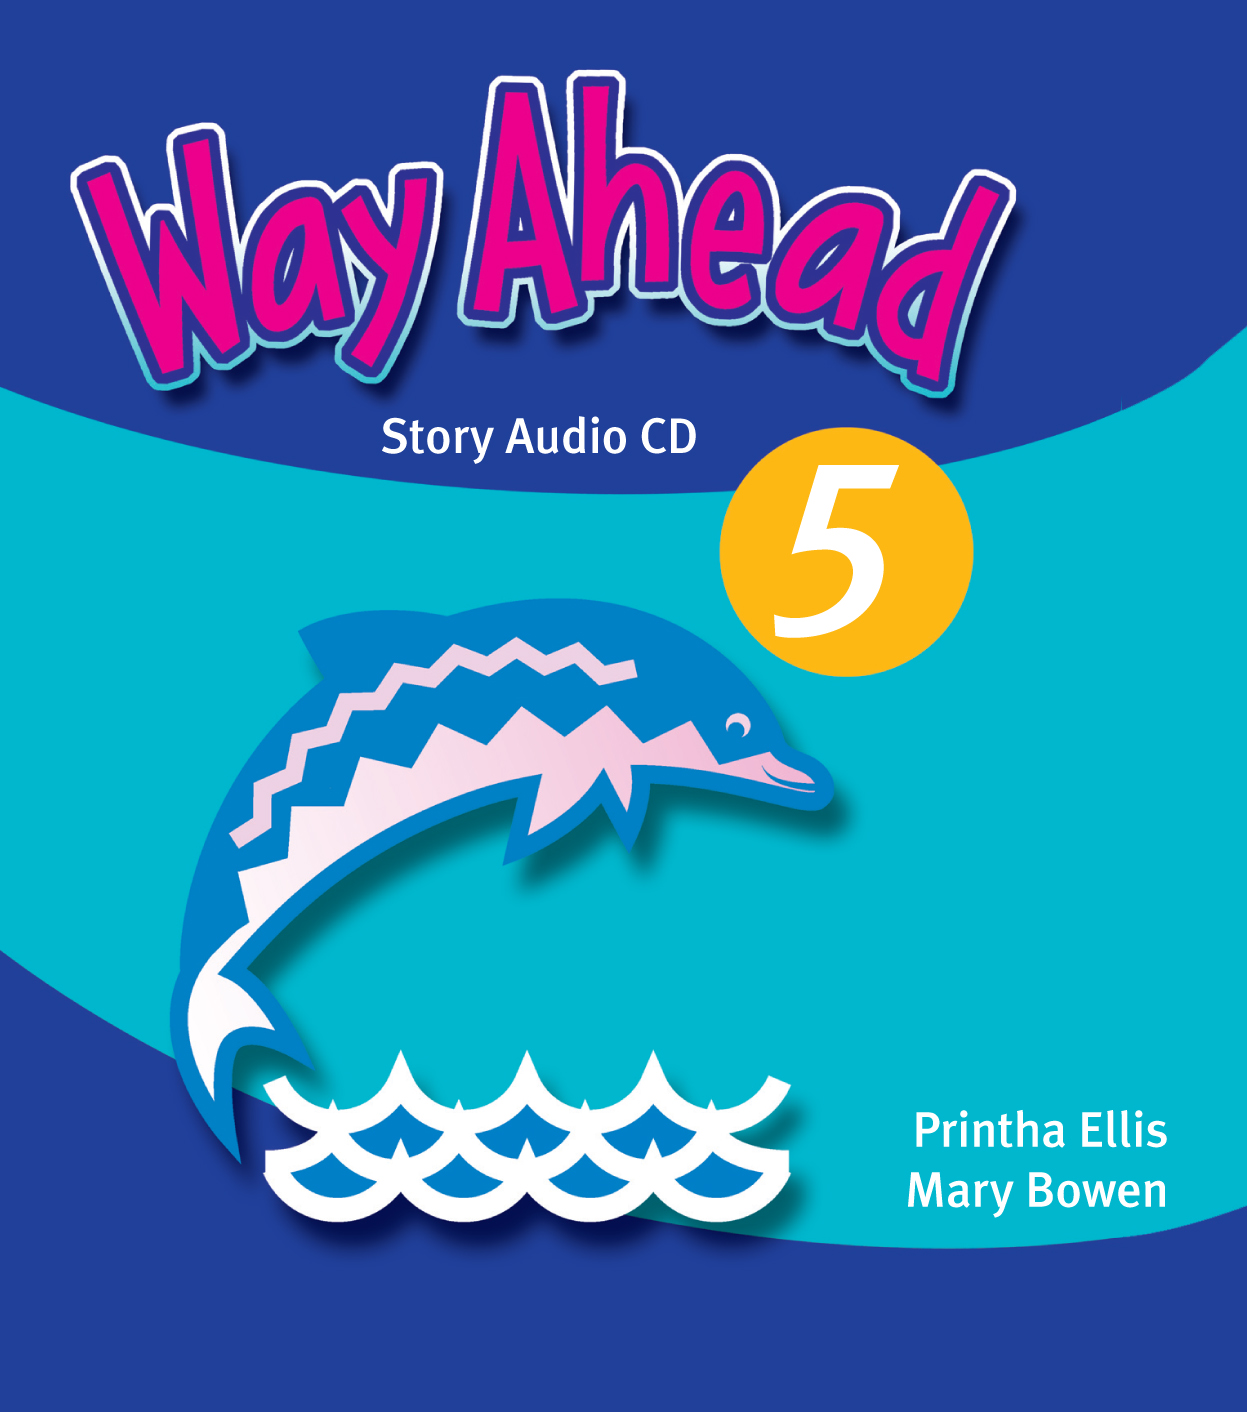 Way Ahead 5 Story Audio CD